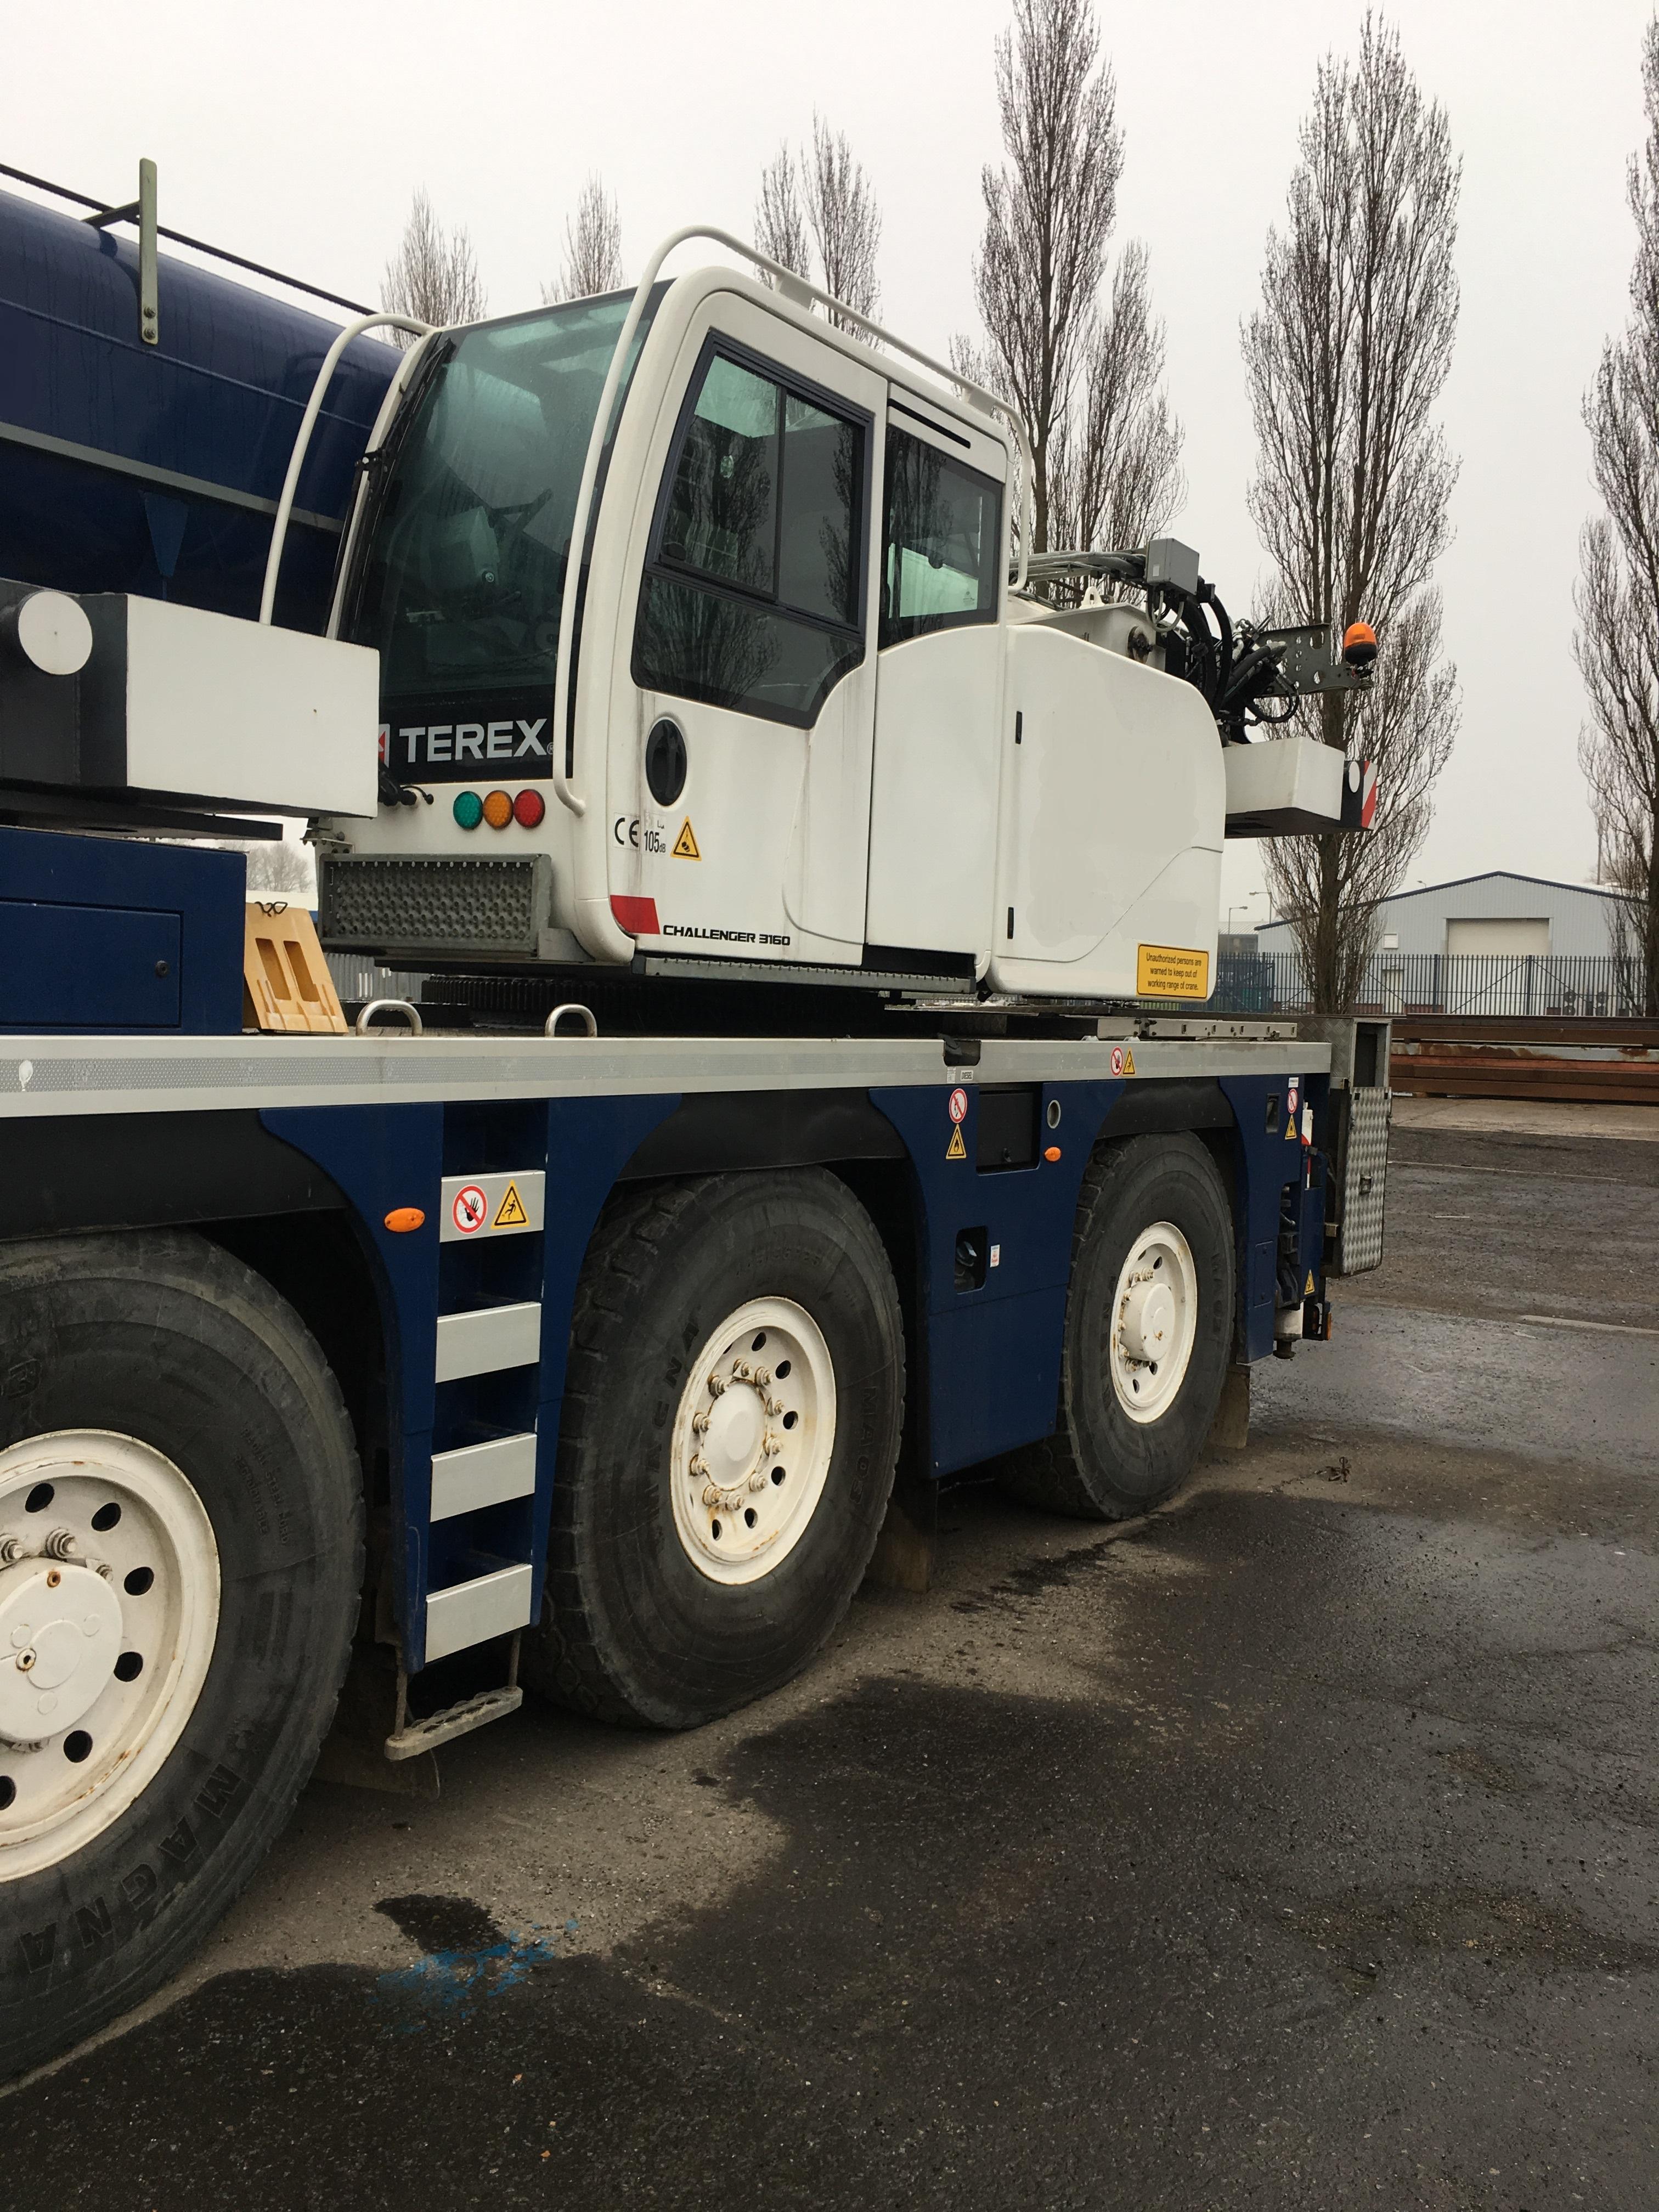 Terex Challenger 3160 Omnia Machinery